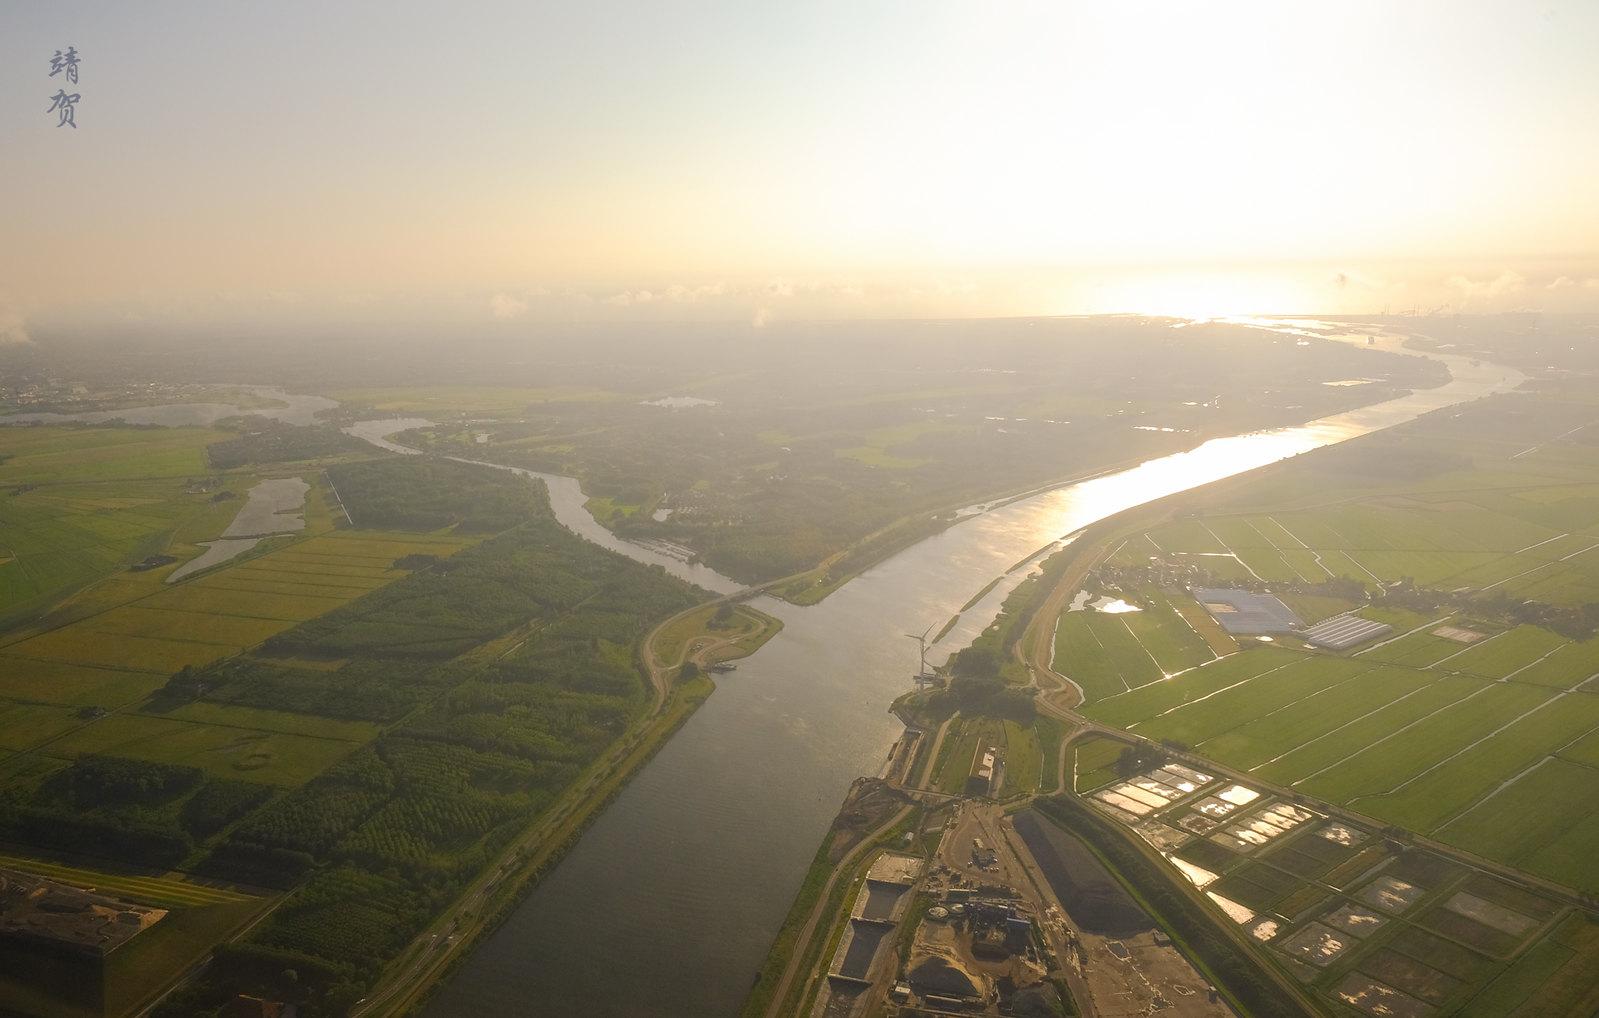 Descent into Amsterdam Schiphol